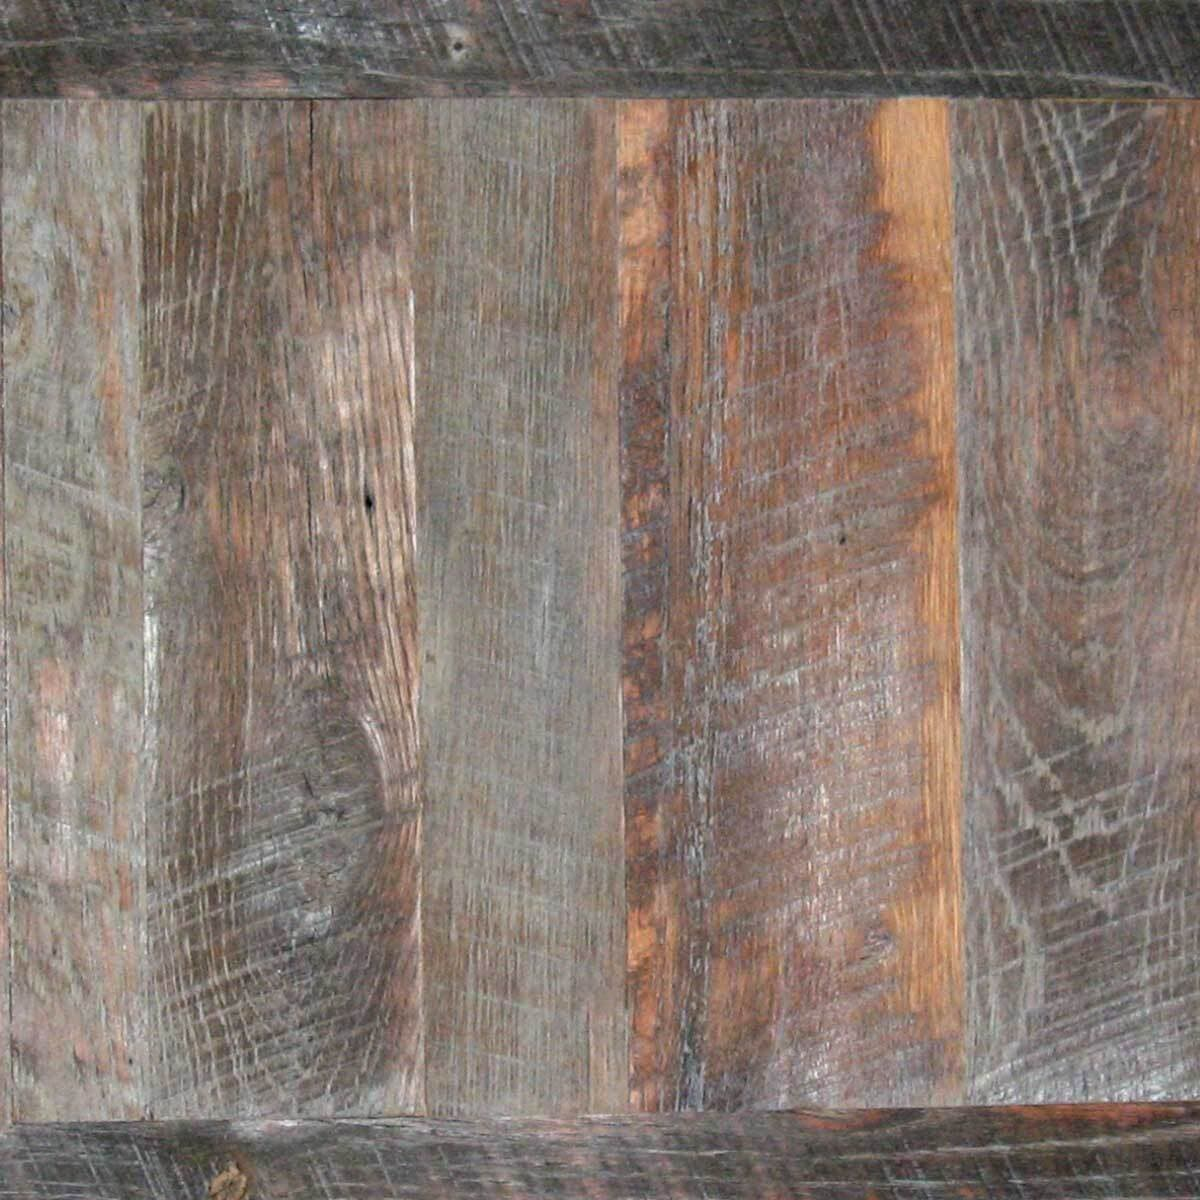 Castle Grey Character Oak wood finish by whole log lumber